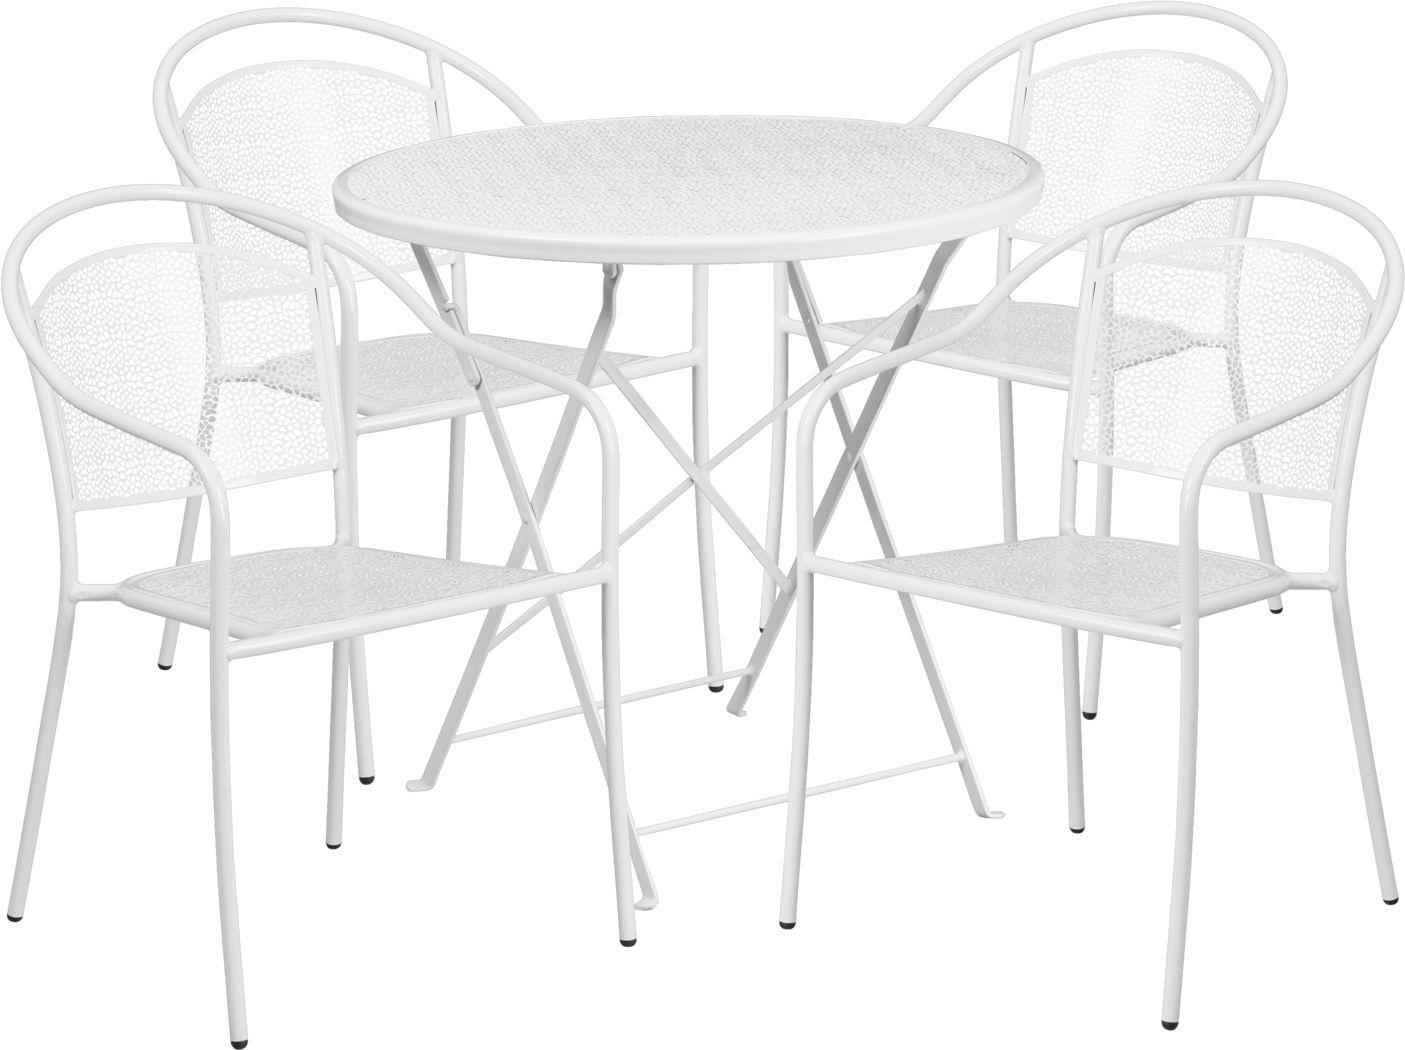 Sunnyside Terrace White 5 Pc 30 in. Round Folding Patio Set